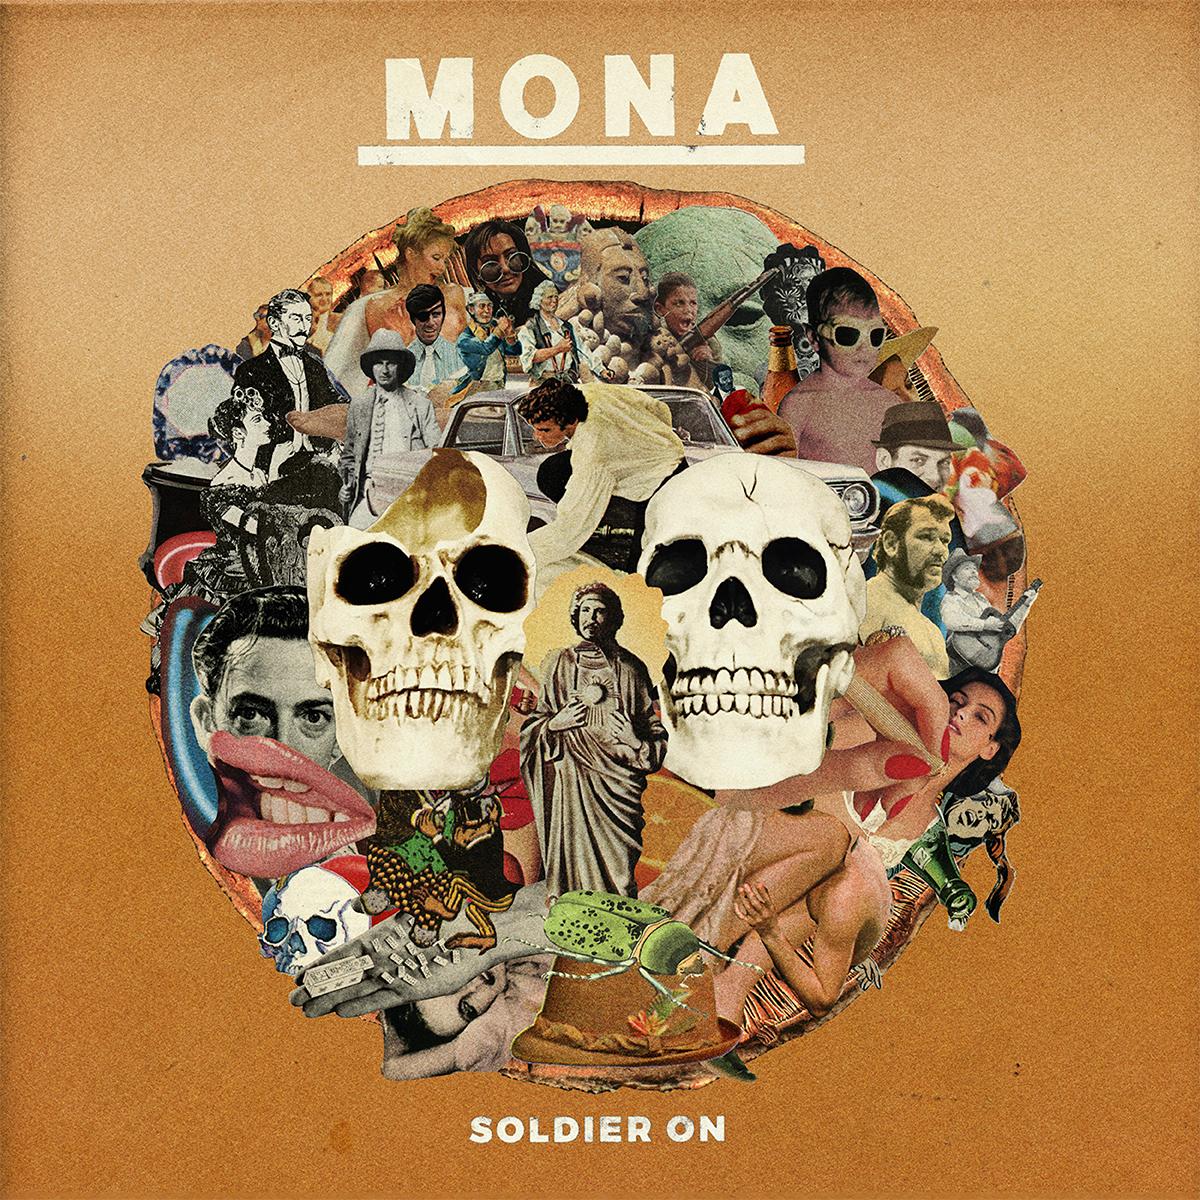 Mona-Soldier mp3image.jpg